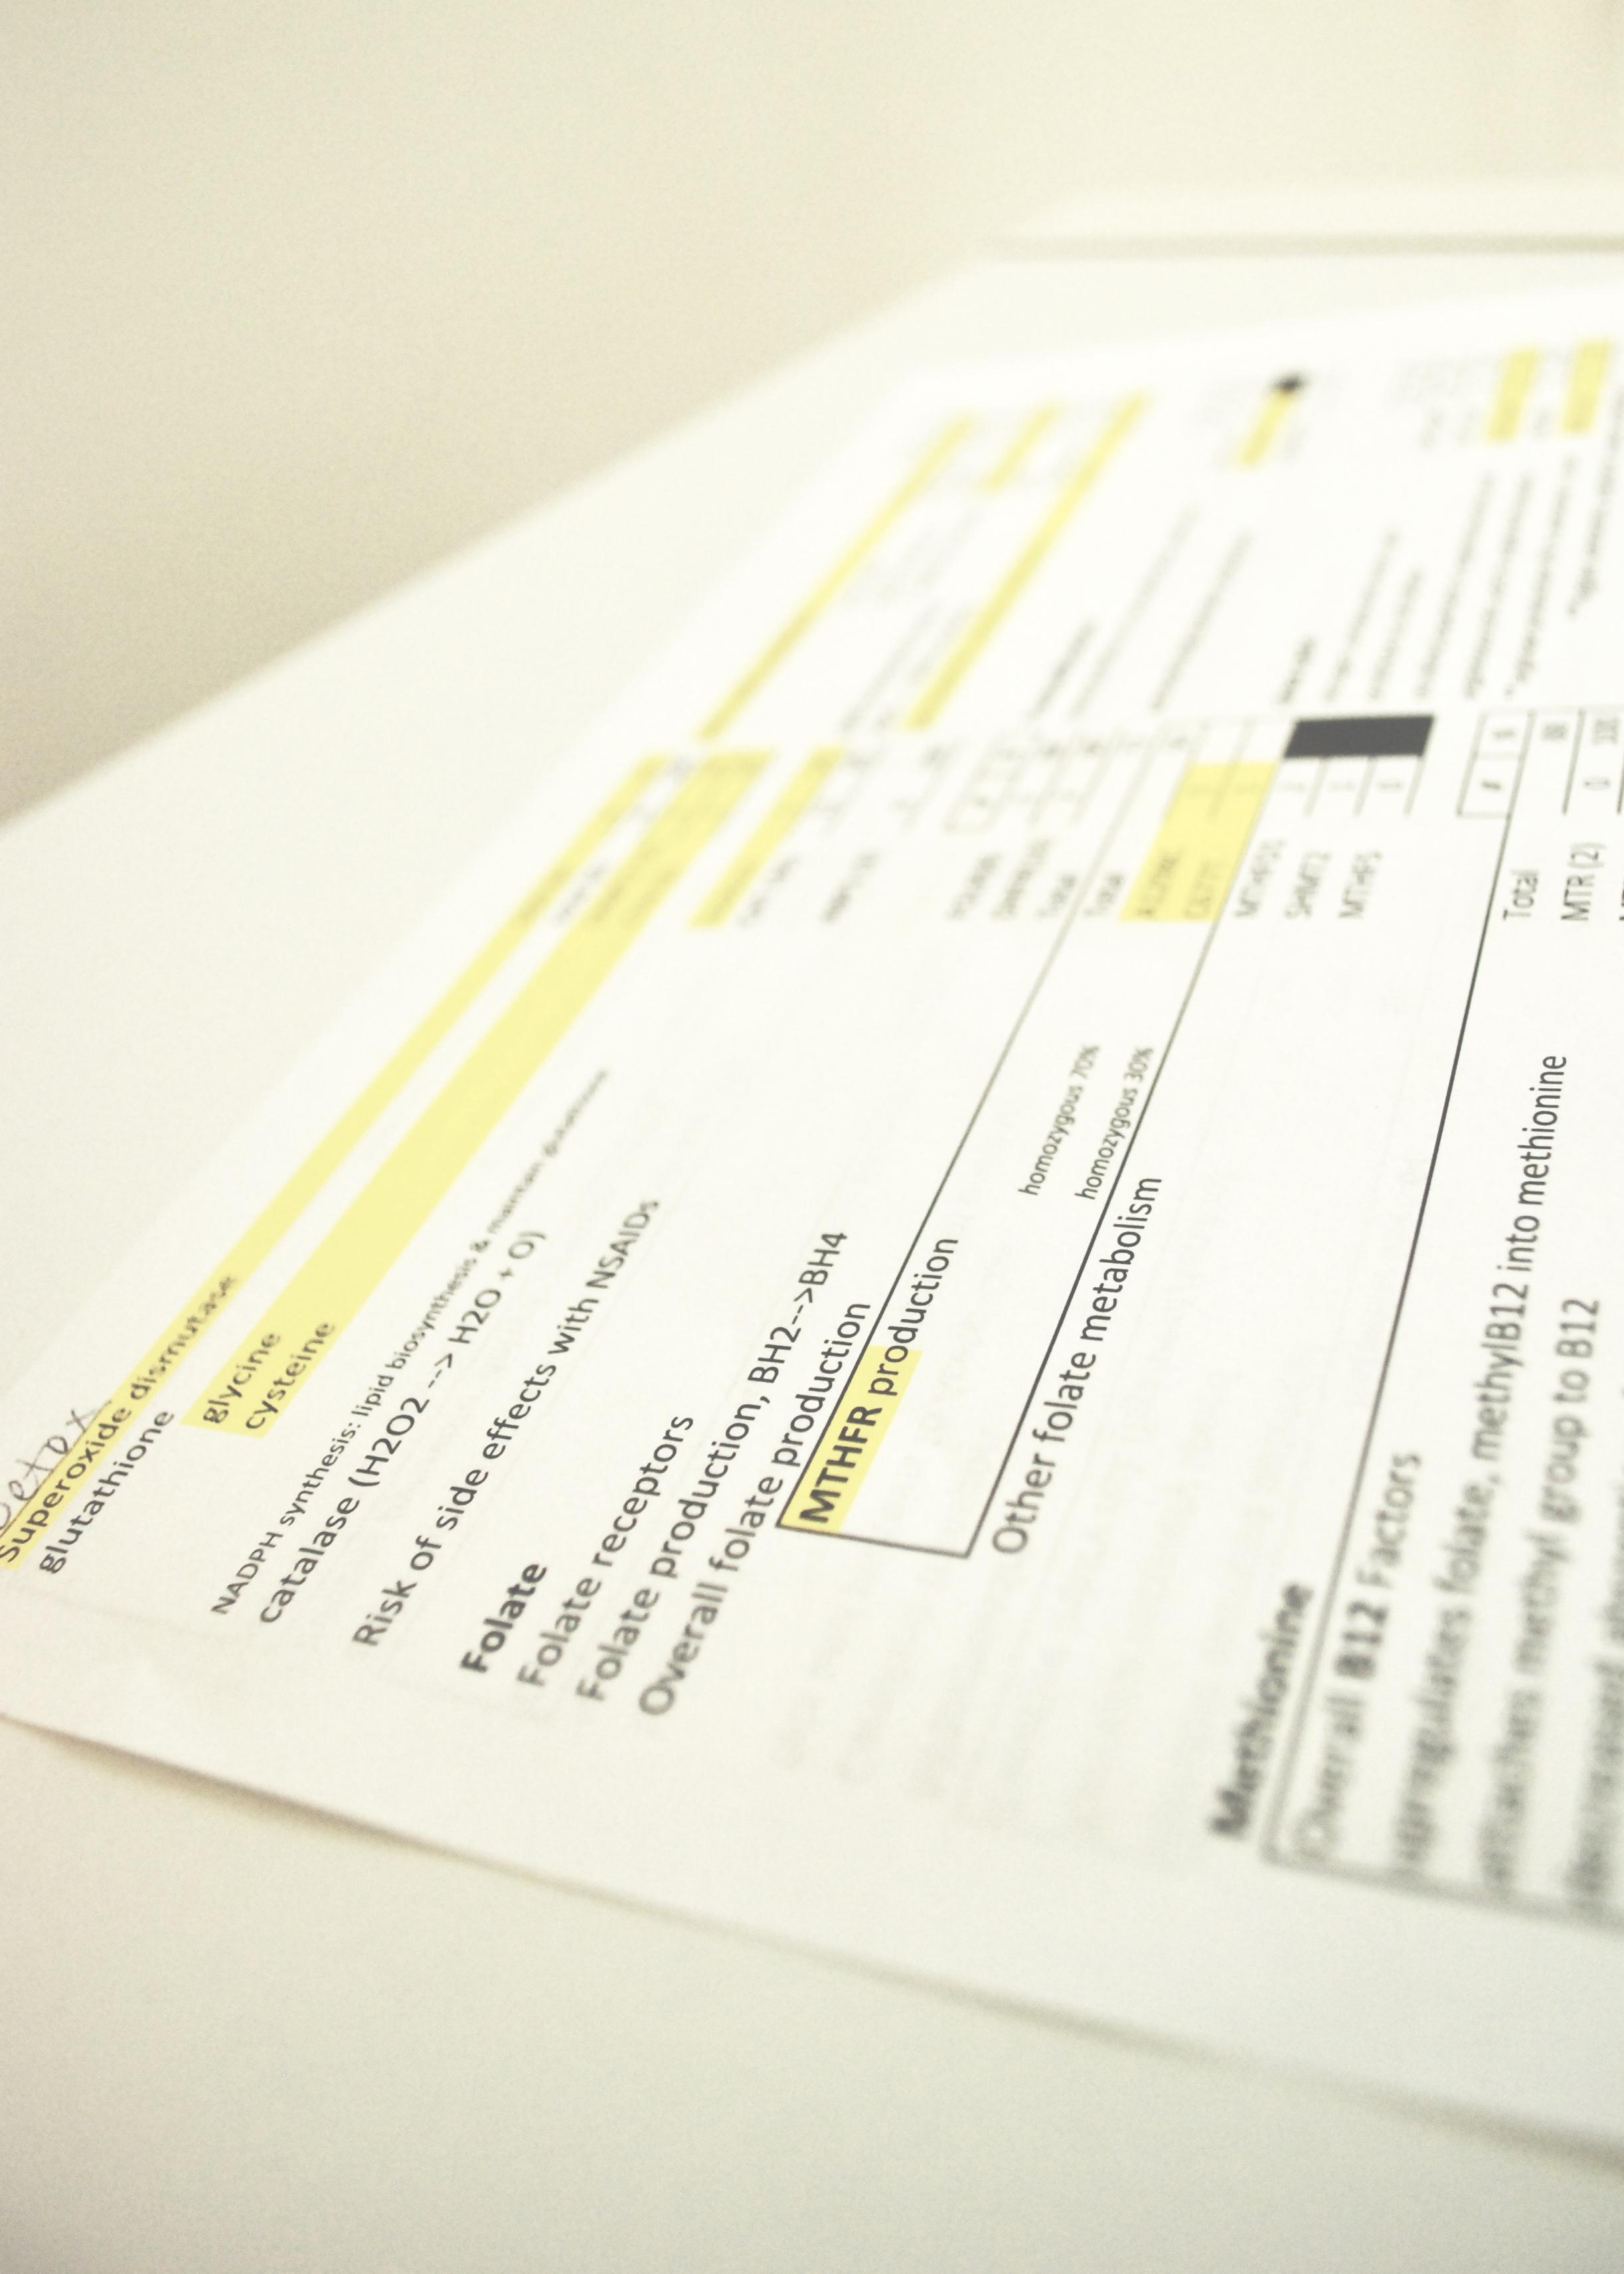 My Rigorous Treatment Plan | TTC After Loss